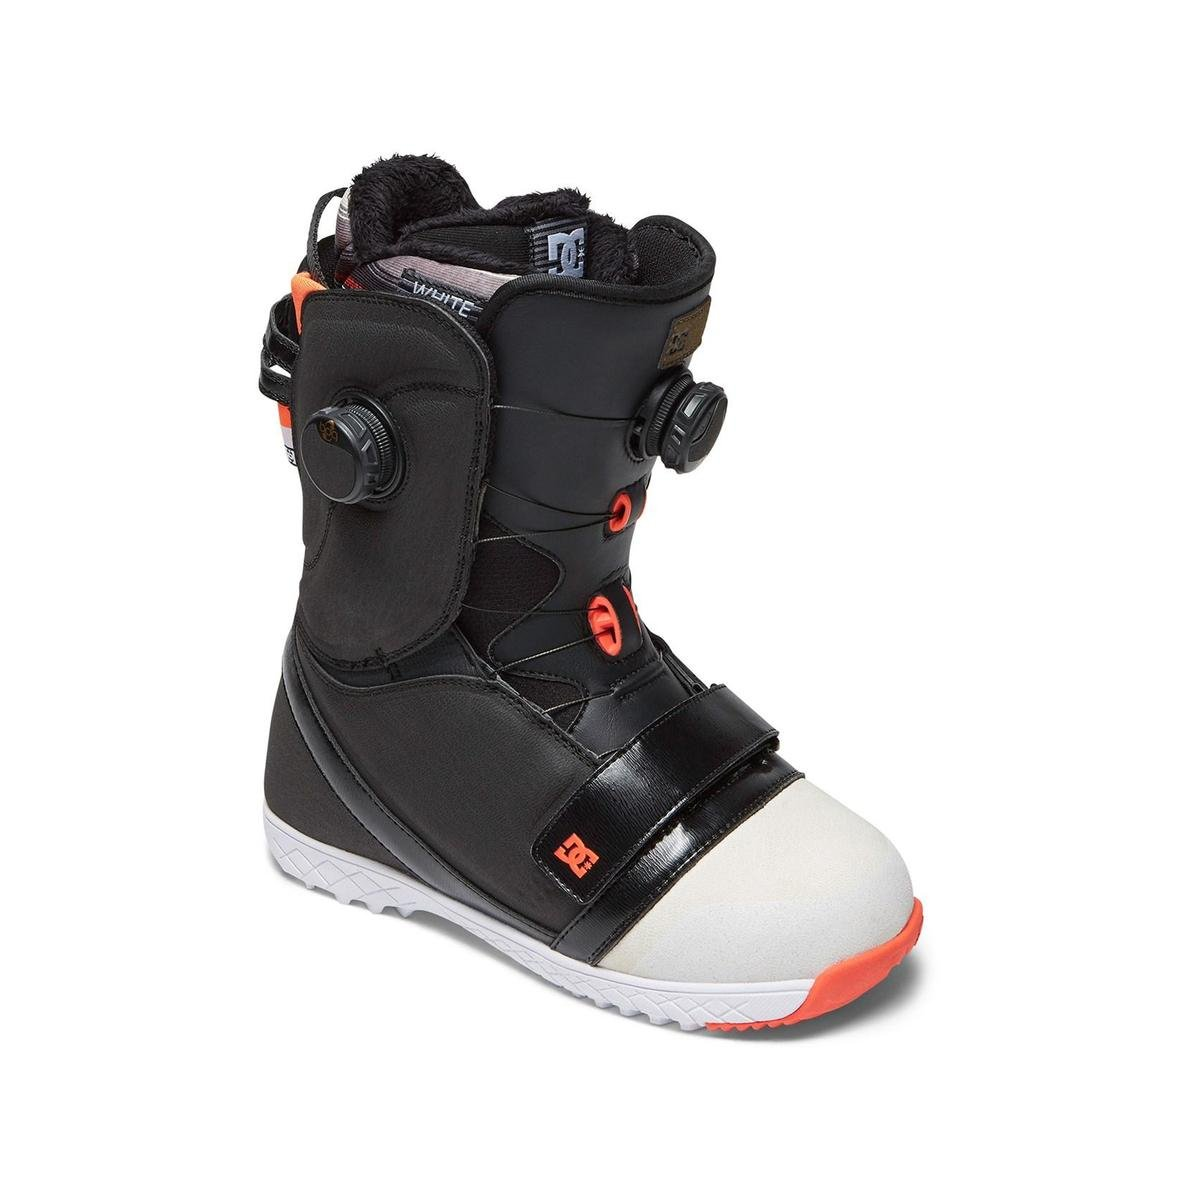 DC Women's Mora Dual Boa Snowboard Boots, Black/White/Pink, 6 by DC